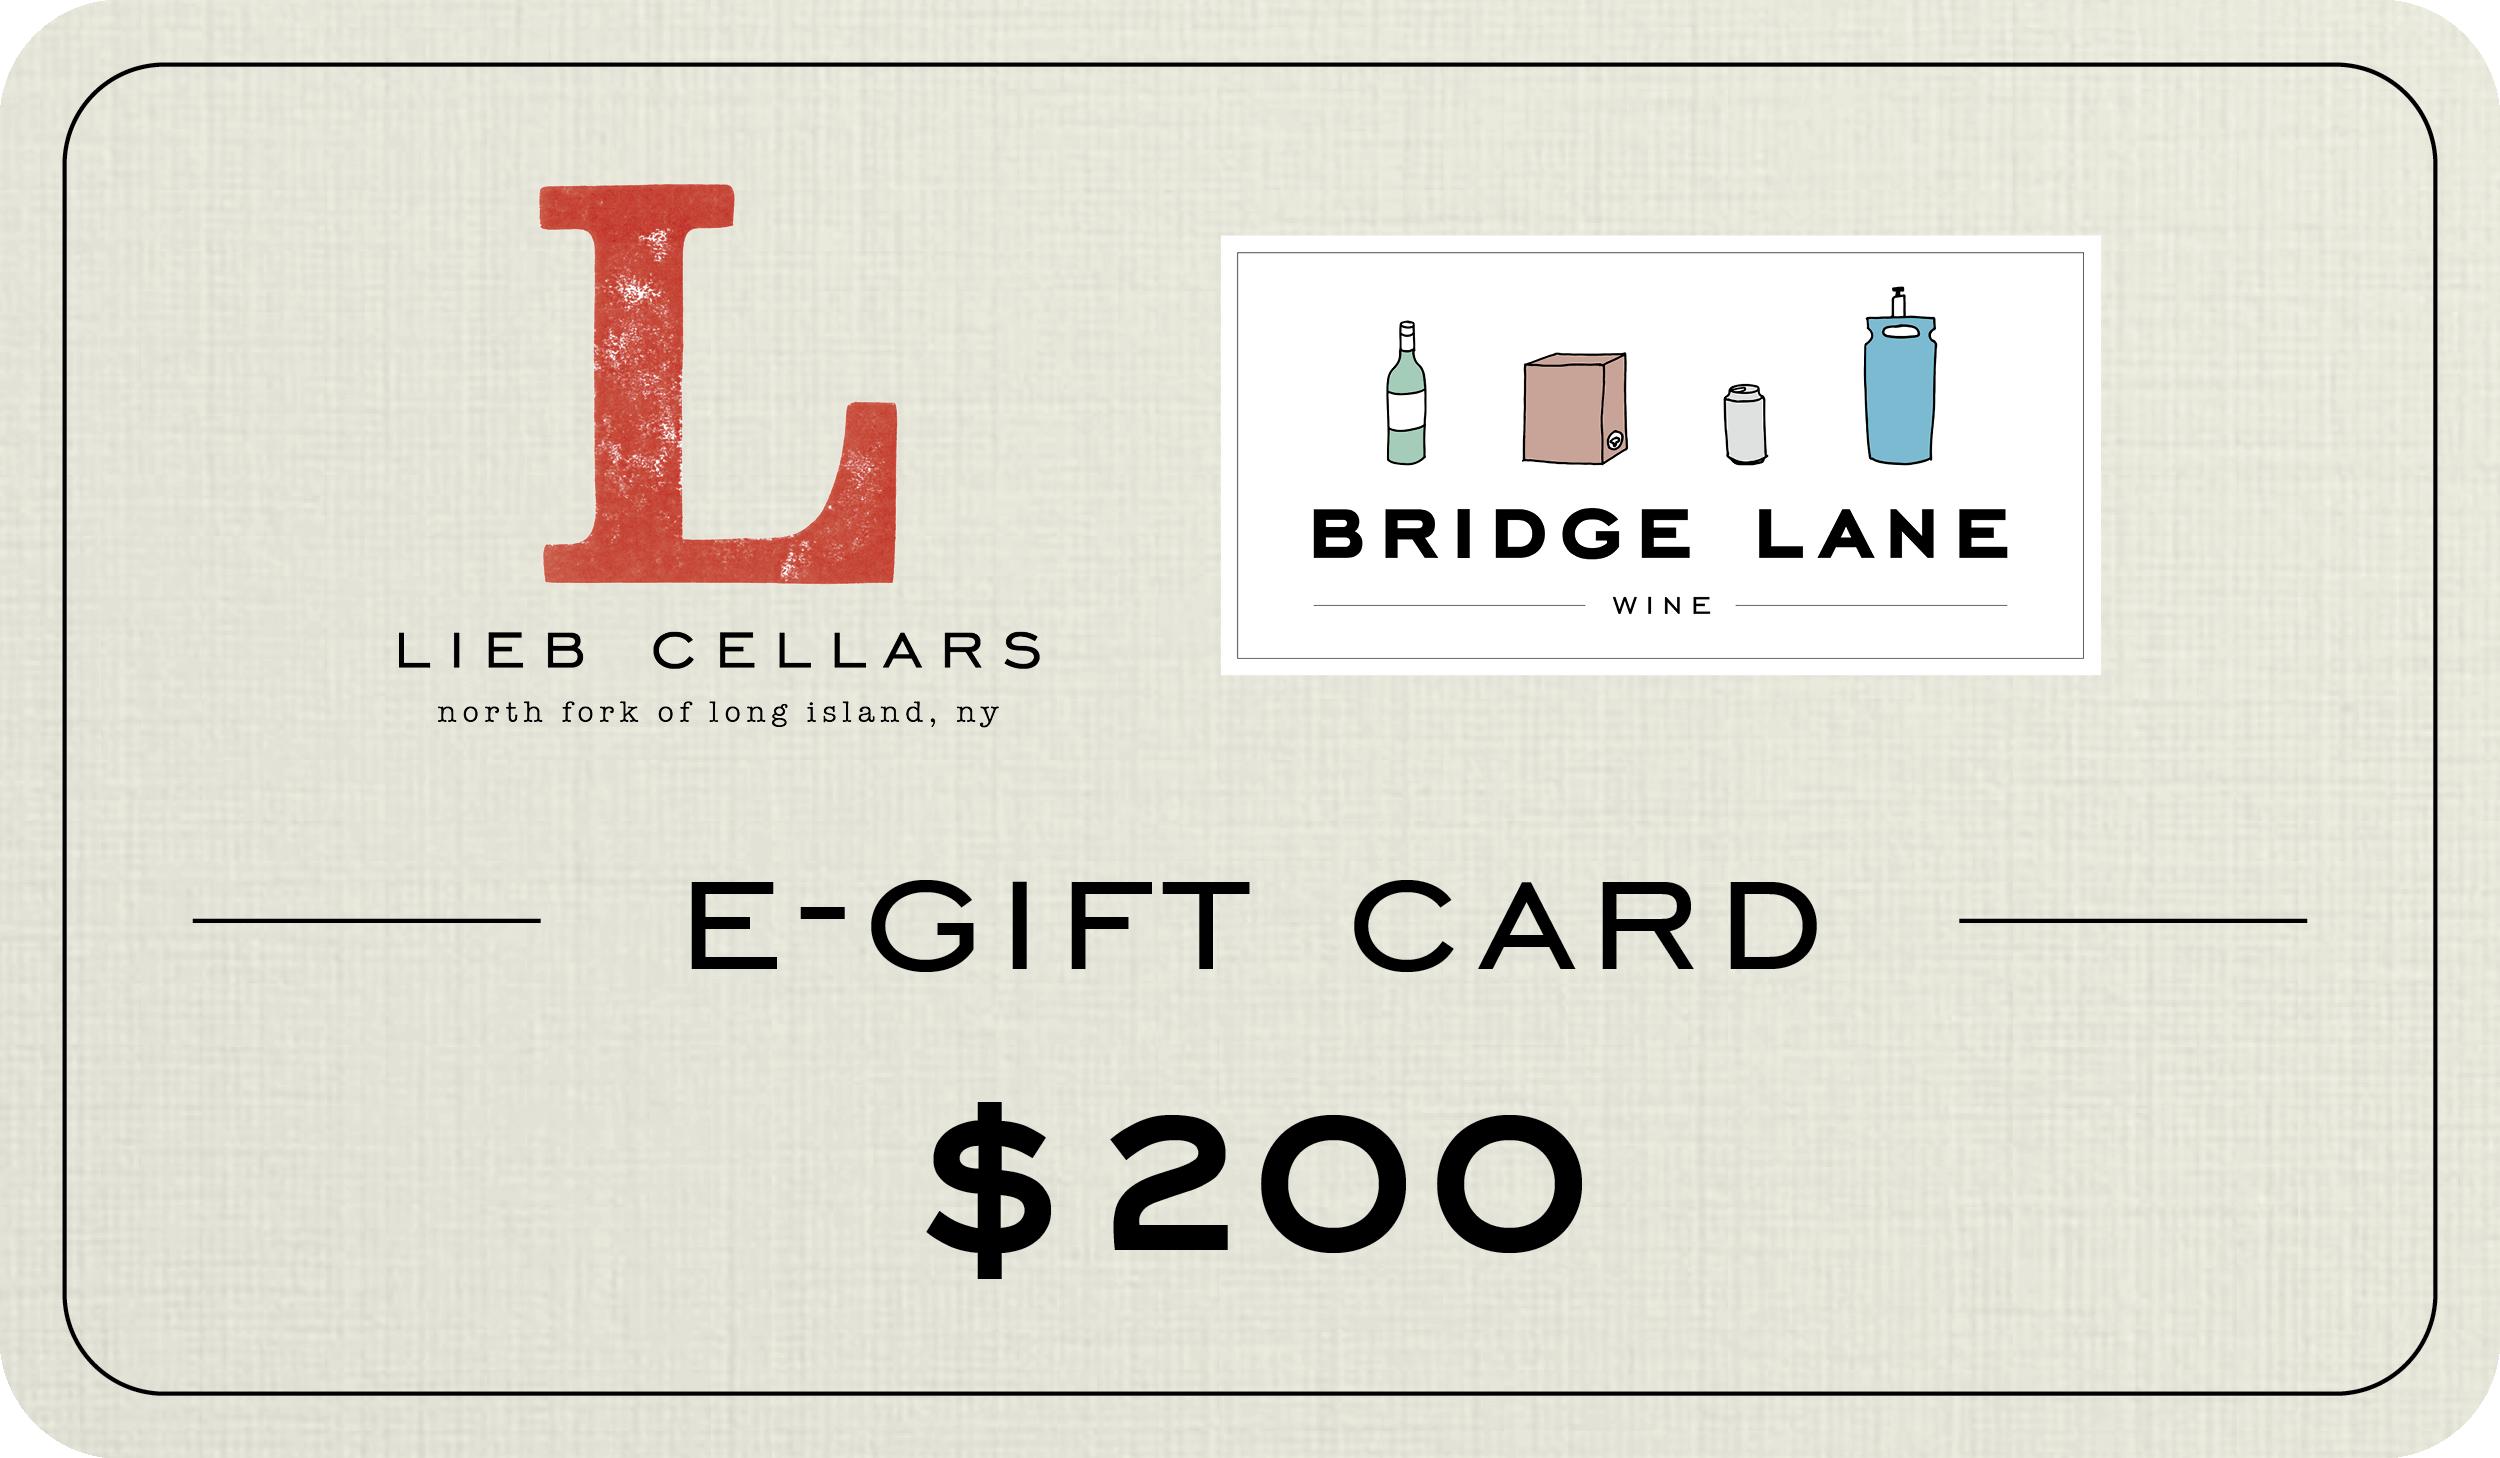 $200 E-Gift Cards